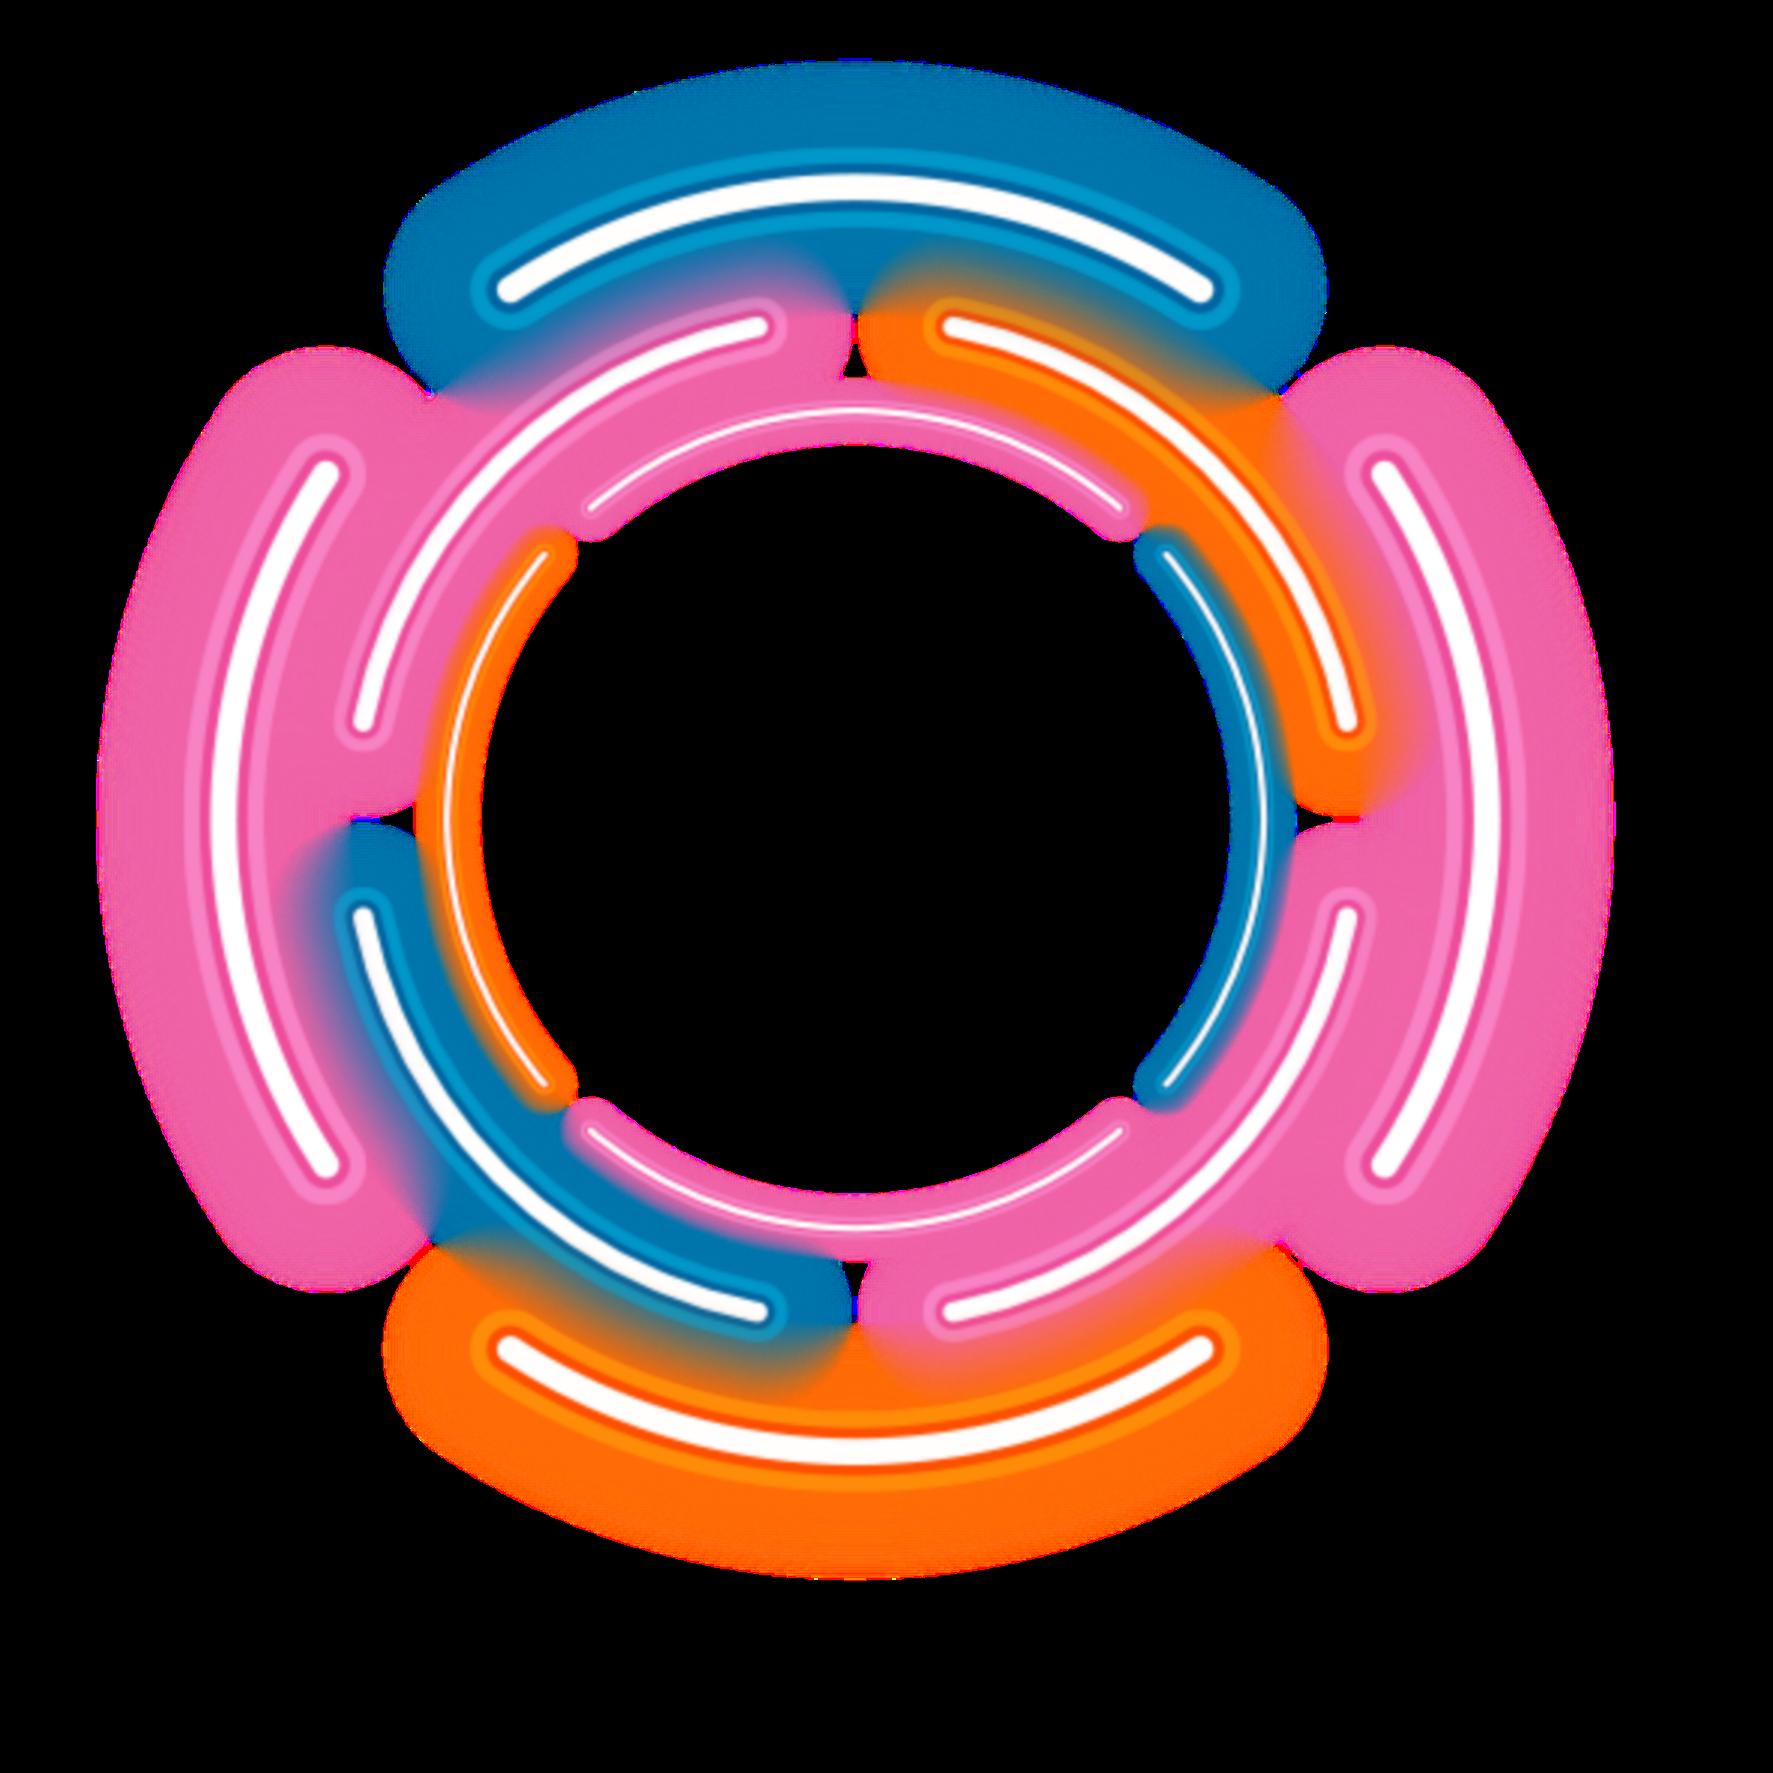 Neon Round Circle Rounds Yuvarlak Frame Frames